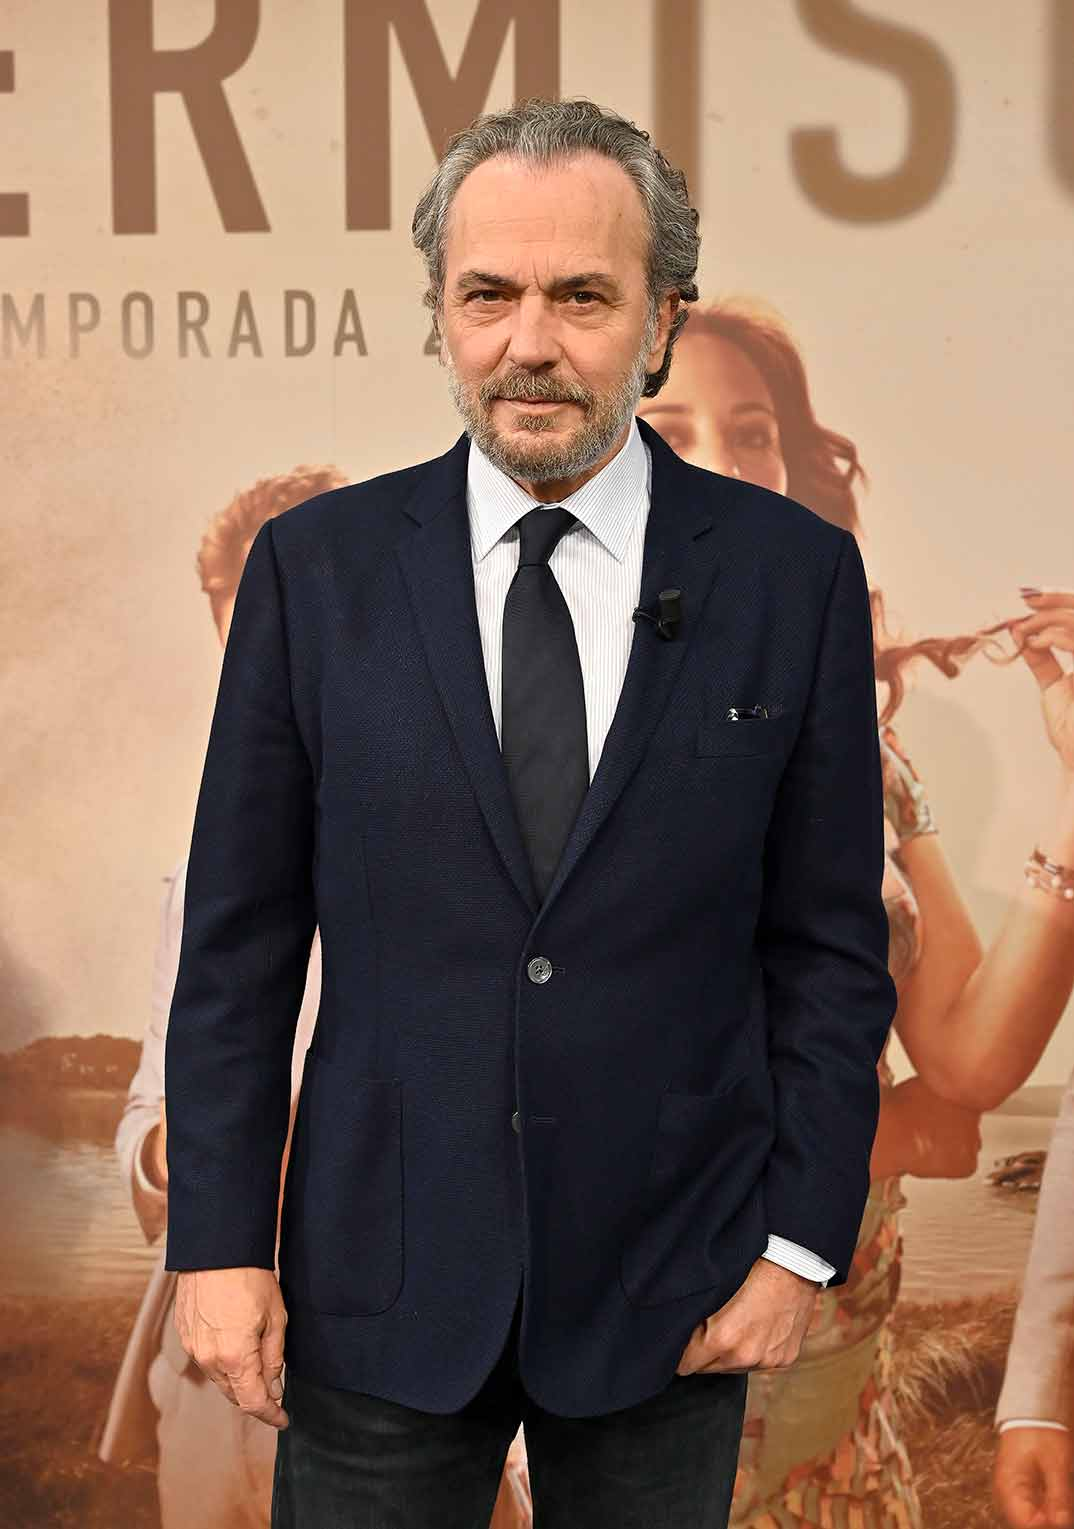 José Coronado - Vivir sin permiso - Temporada 2 © Mediaset